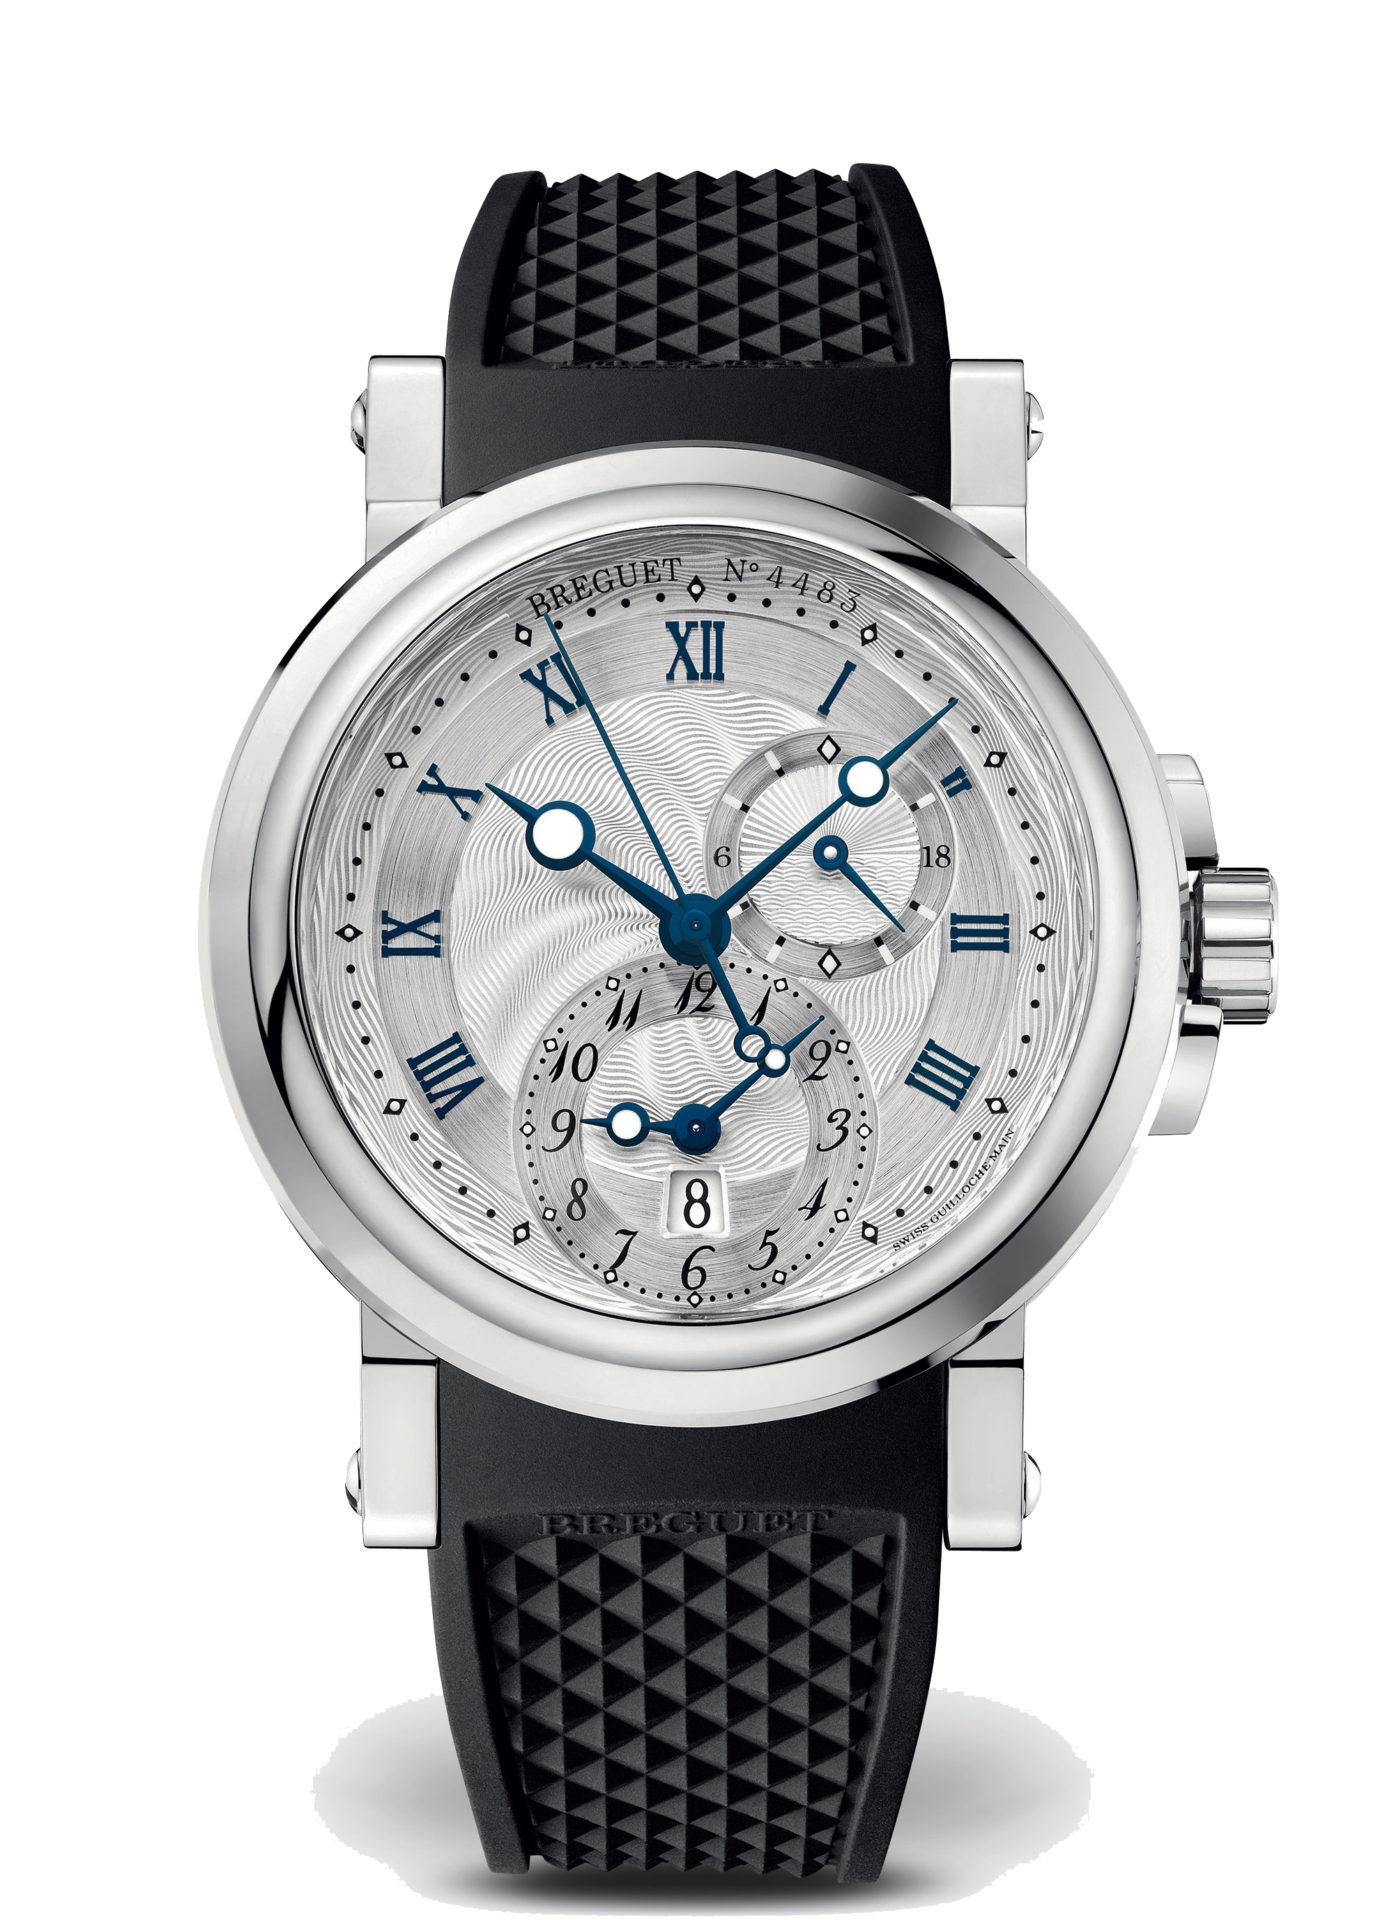 Breguet-La-Marine-5857-Hall-of-Time-5857st-12-5zu